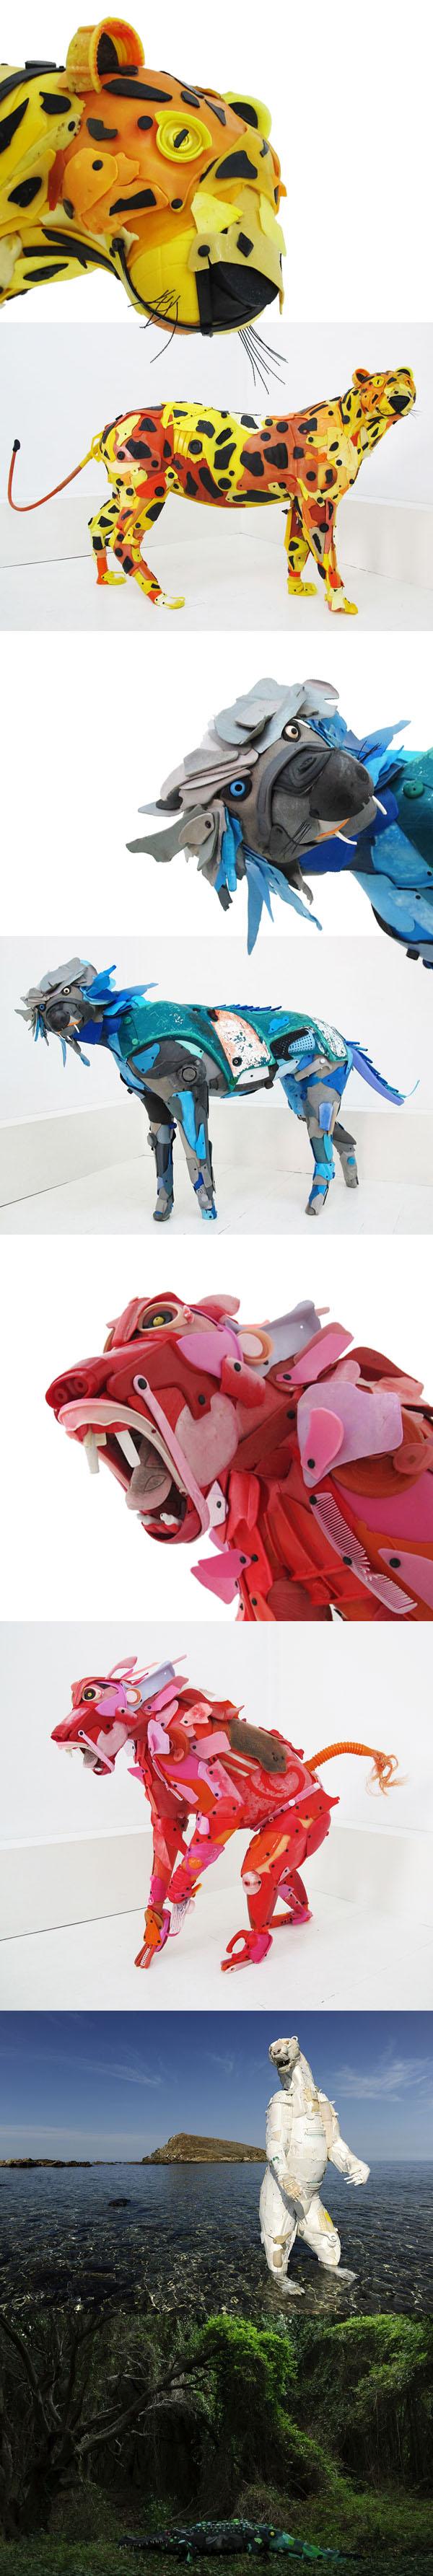 Terra Sophia - Sea Recup' Art - Sculptures de Gilles_Cenzandioti